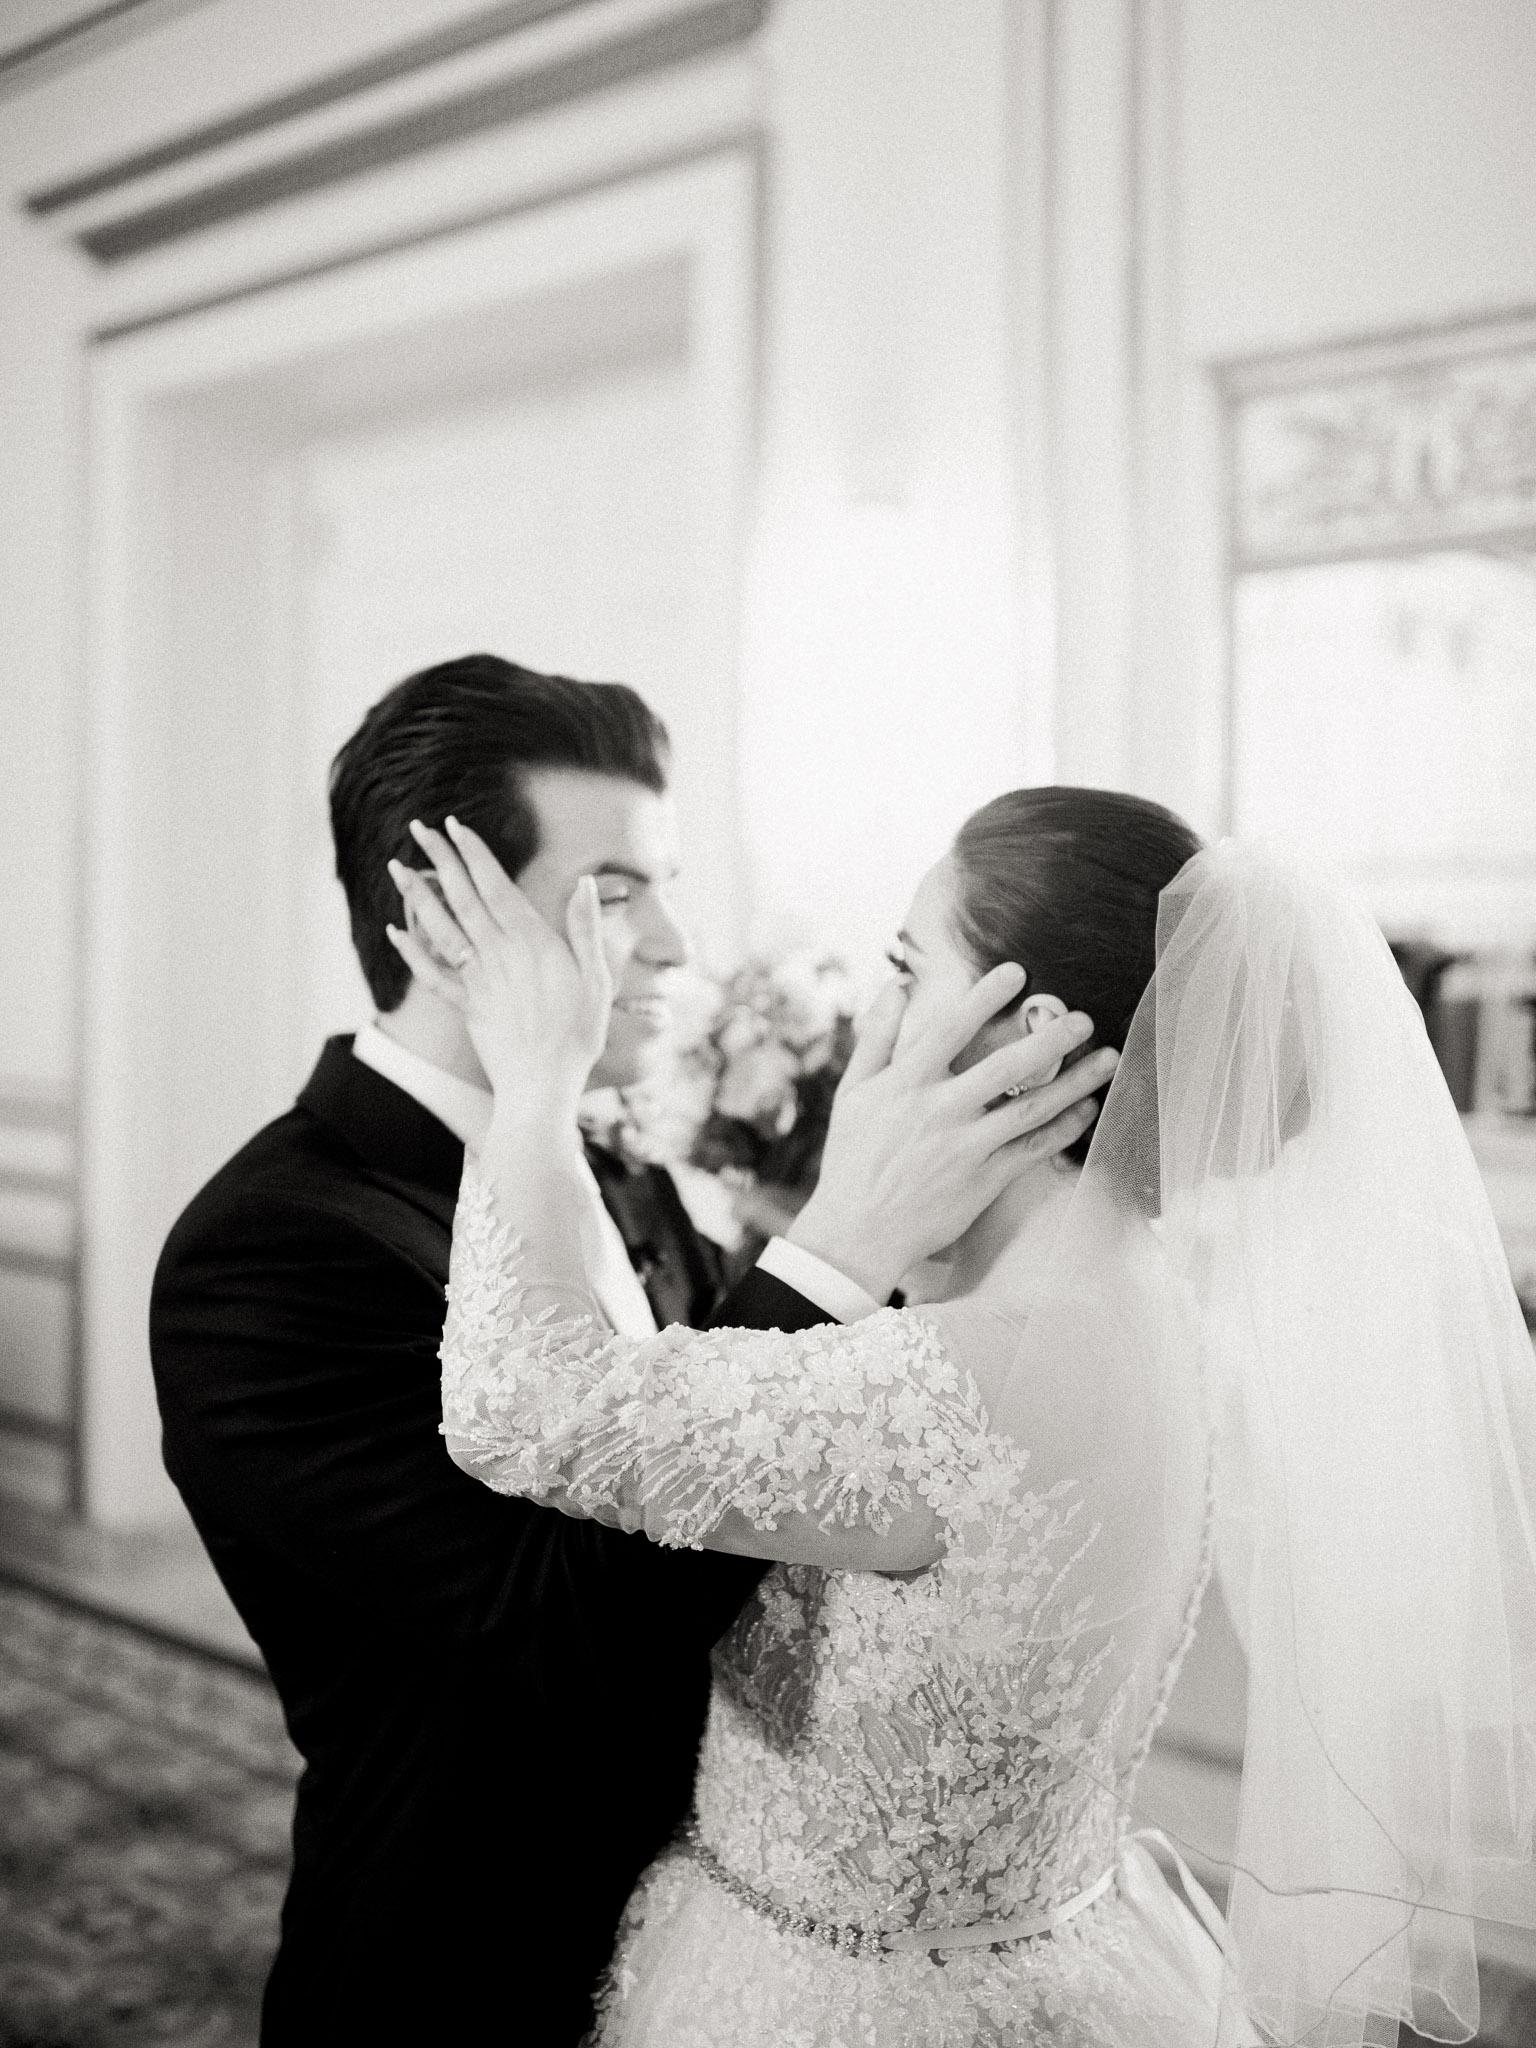 Hanna&Jordan Wedding_HotelVancouver_9379.jpg